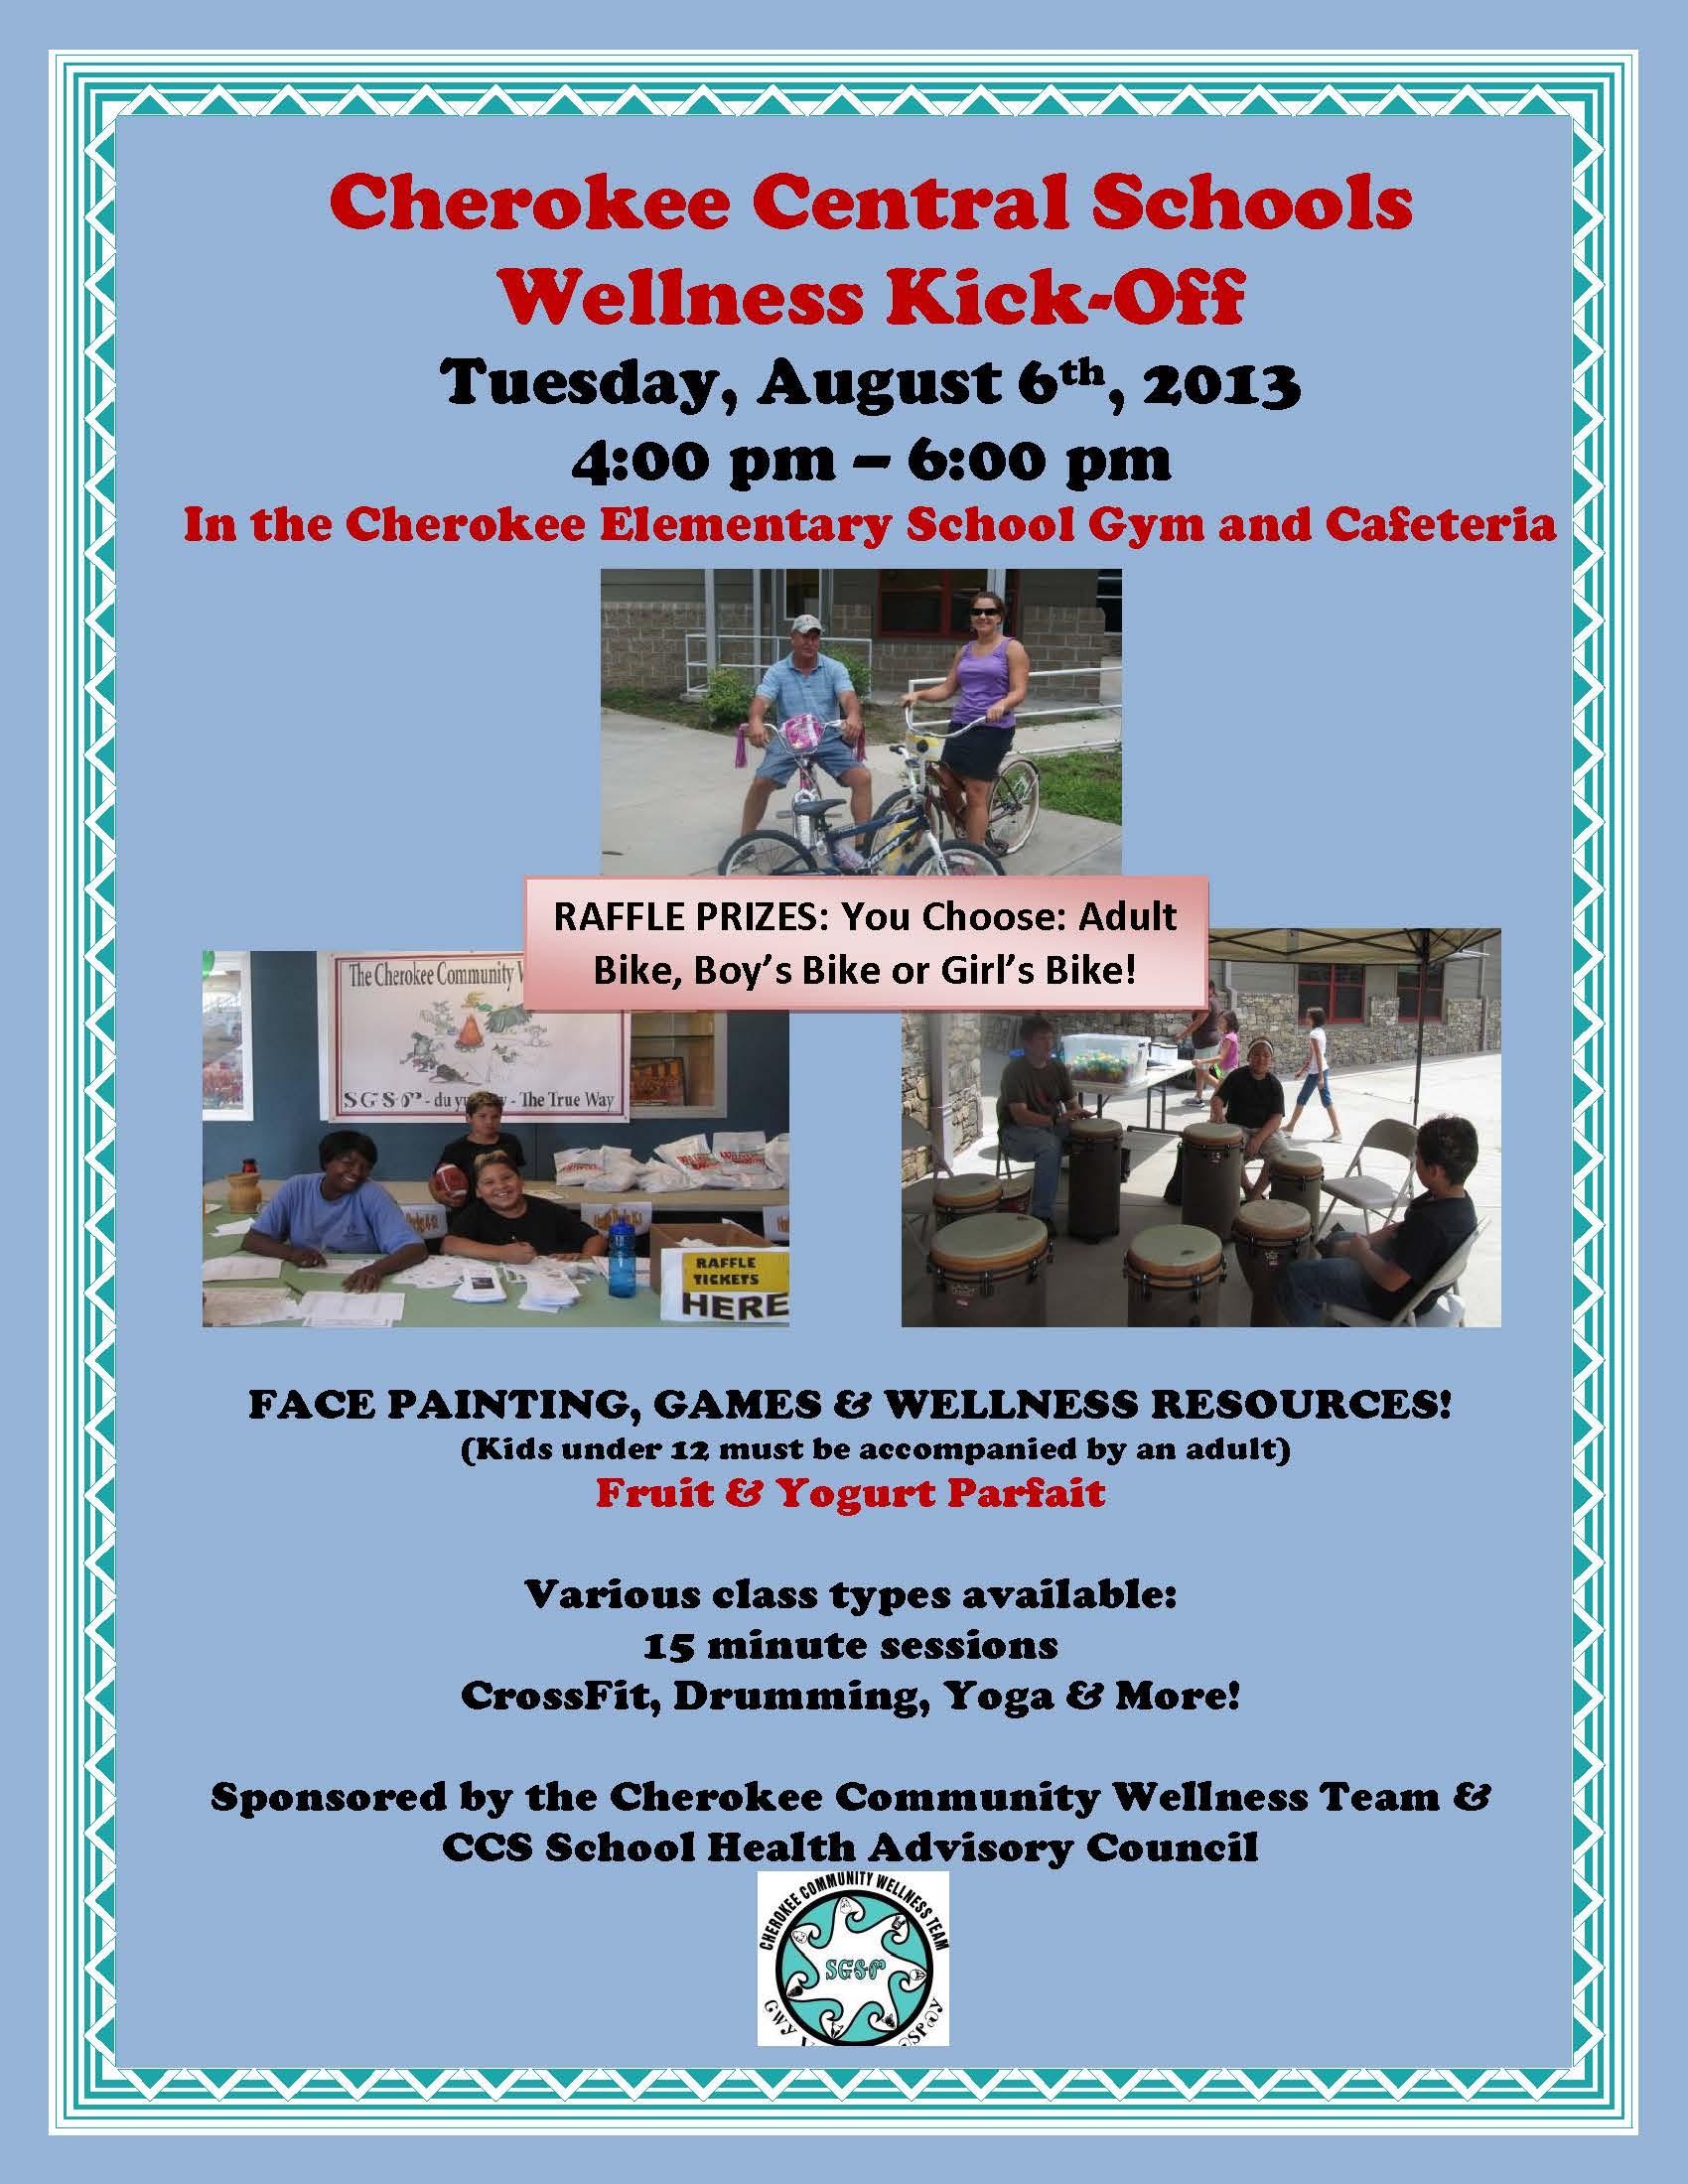 CCS Wellness Kick-off flyer 2013